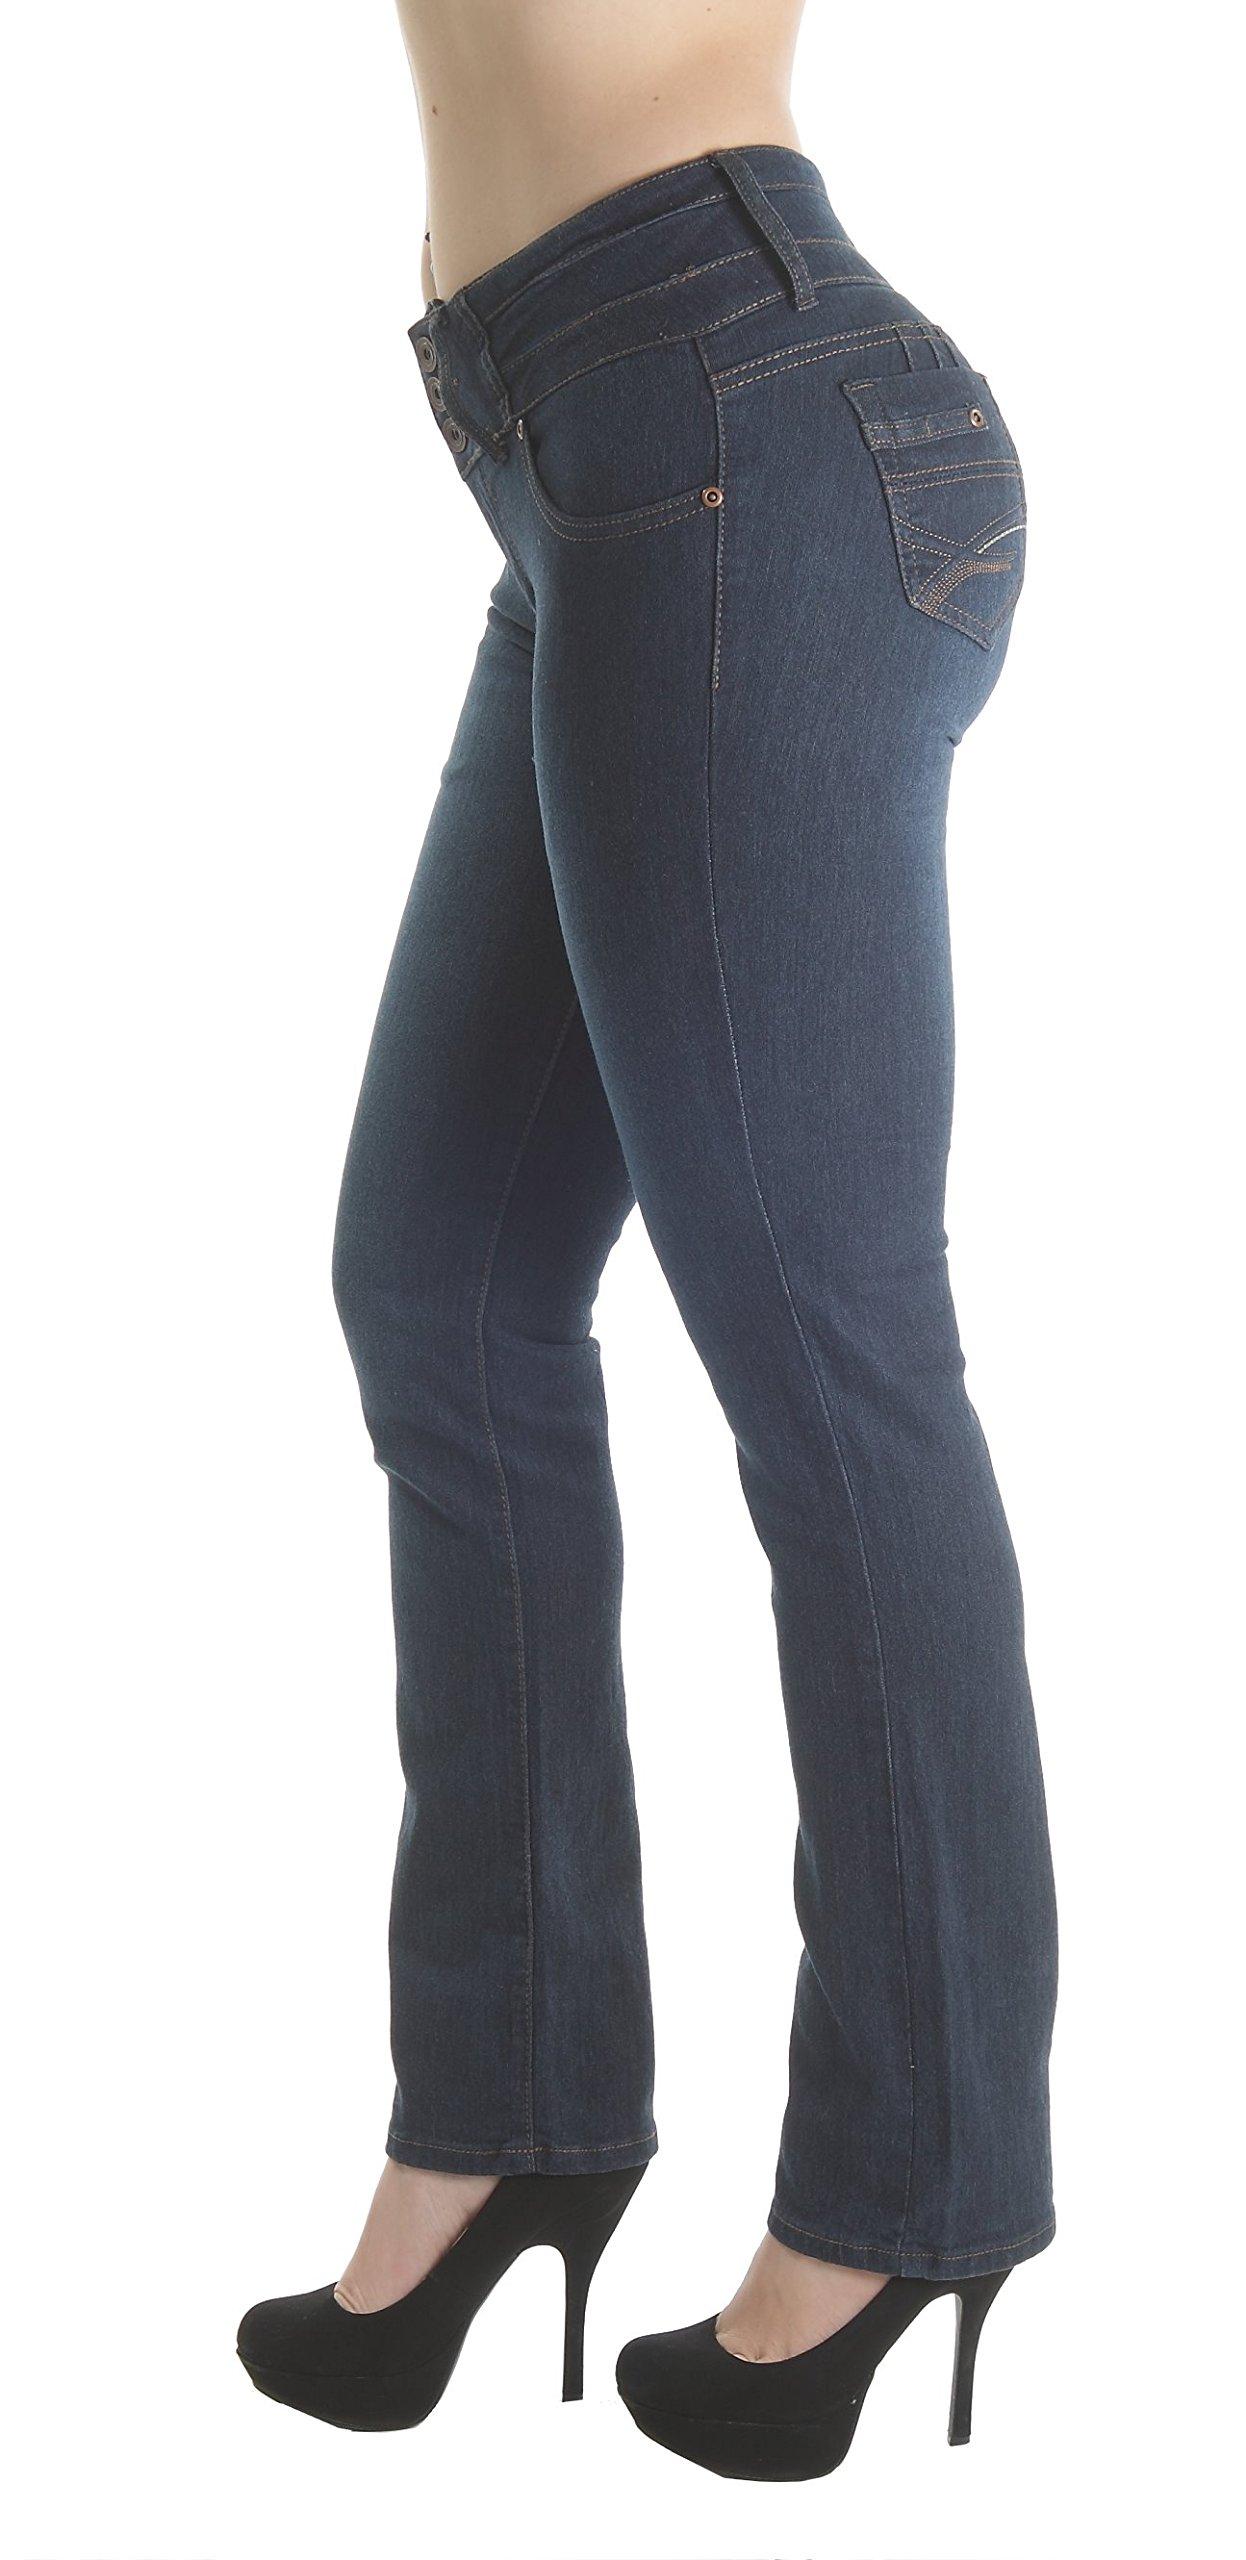 Fashion2Love FCH138BT – Colombian Design, Butt Lift, Levanta Cola, High Waist, Boot Leg Jeans in Navy Size 3